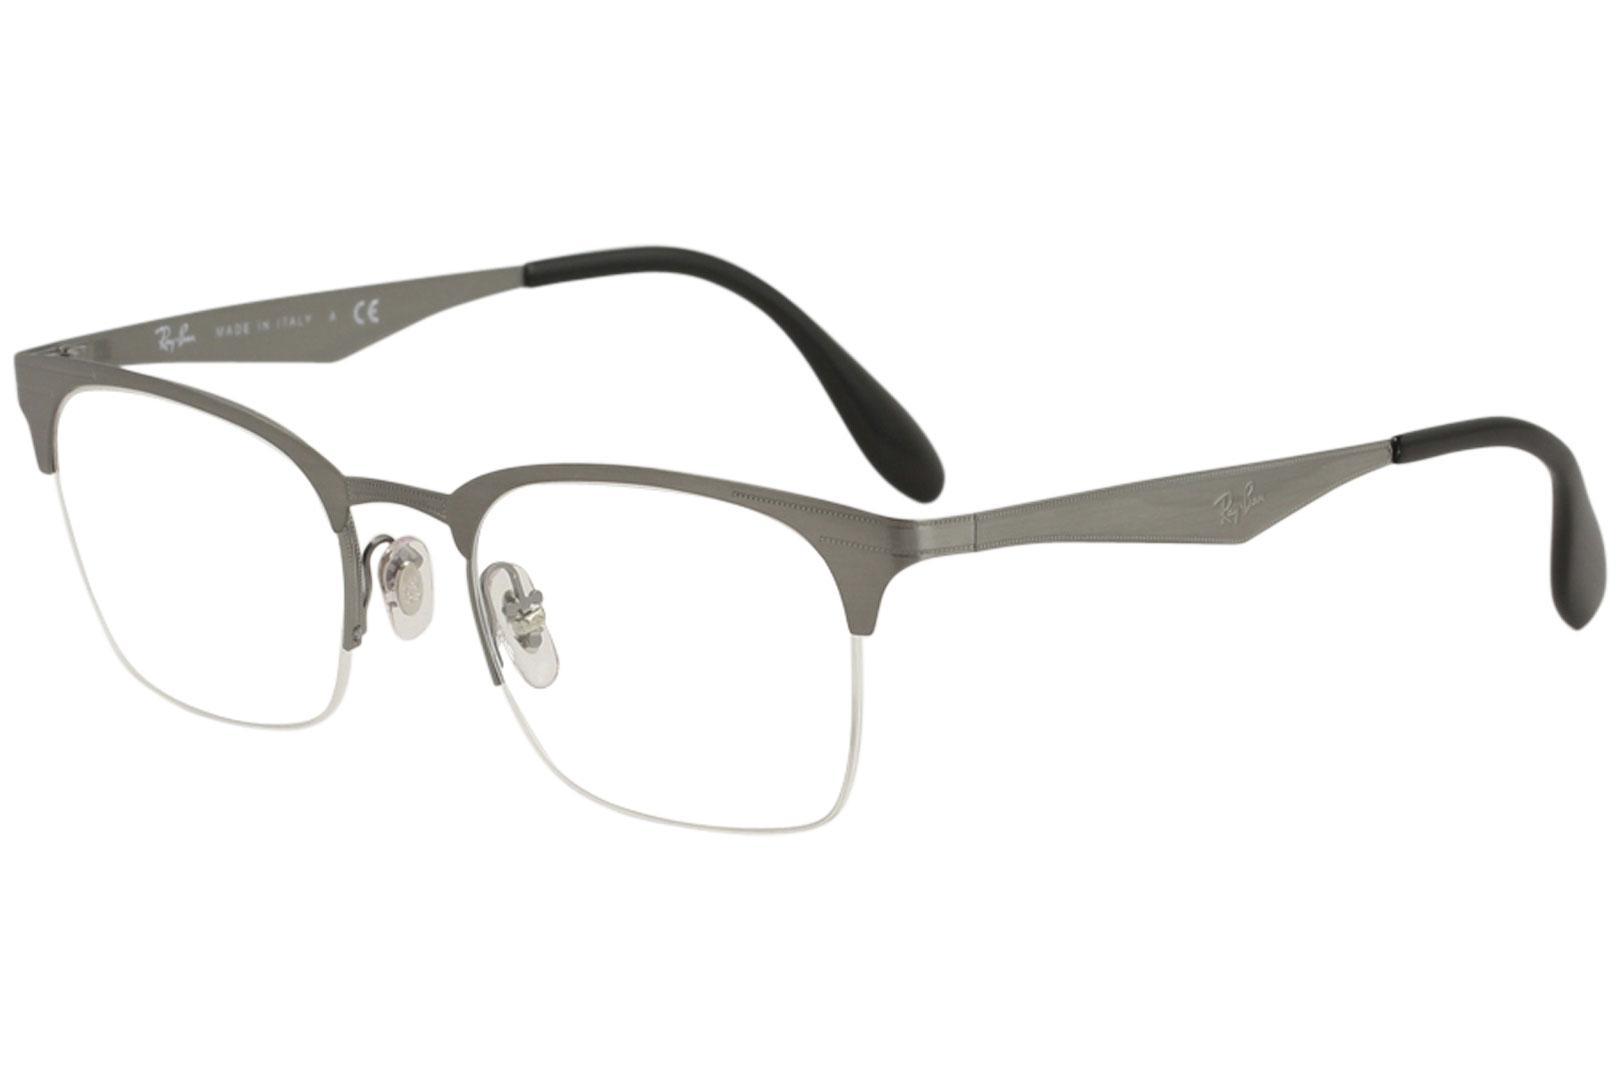 94bed9b82701 Ray Ban Eyeglasses RX6360 RB/6360 RayBan Half Rim Optical Frame